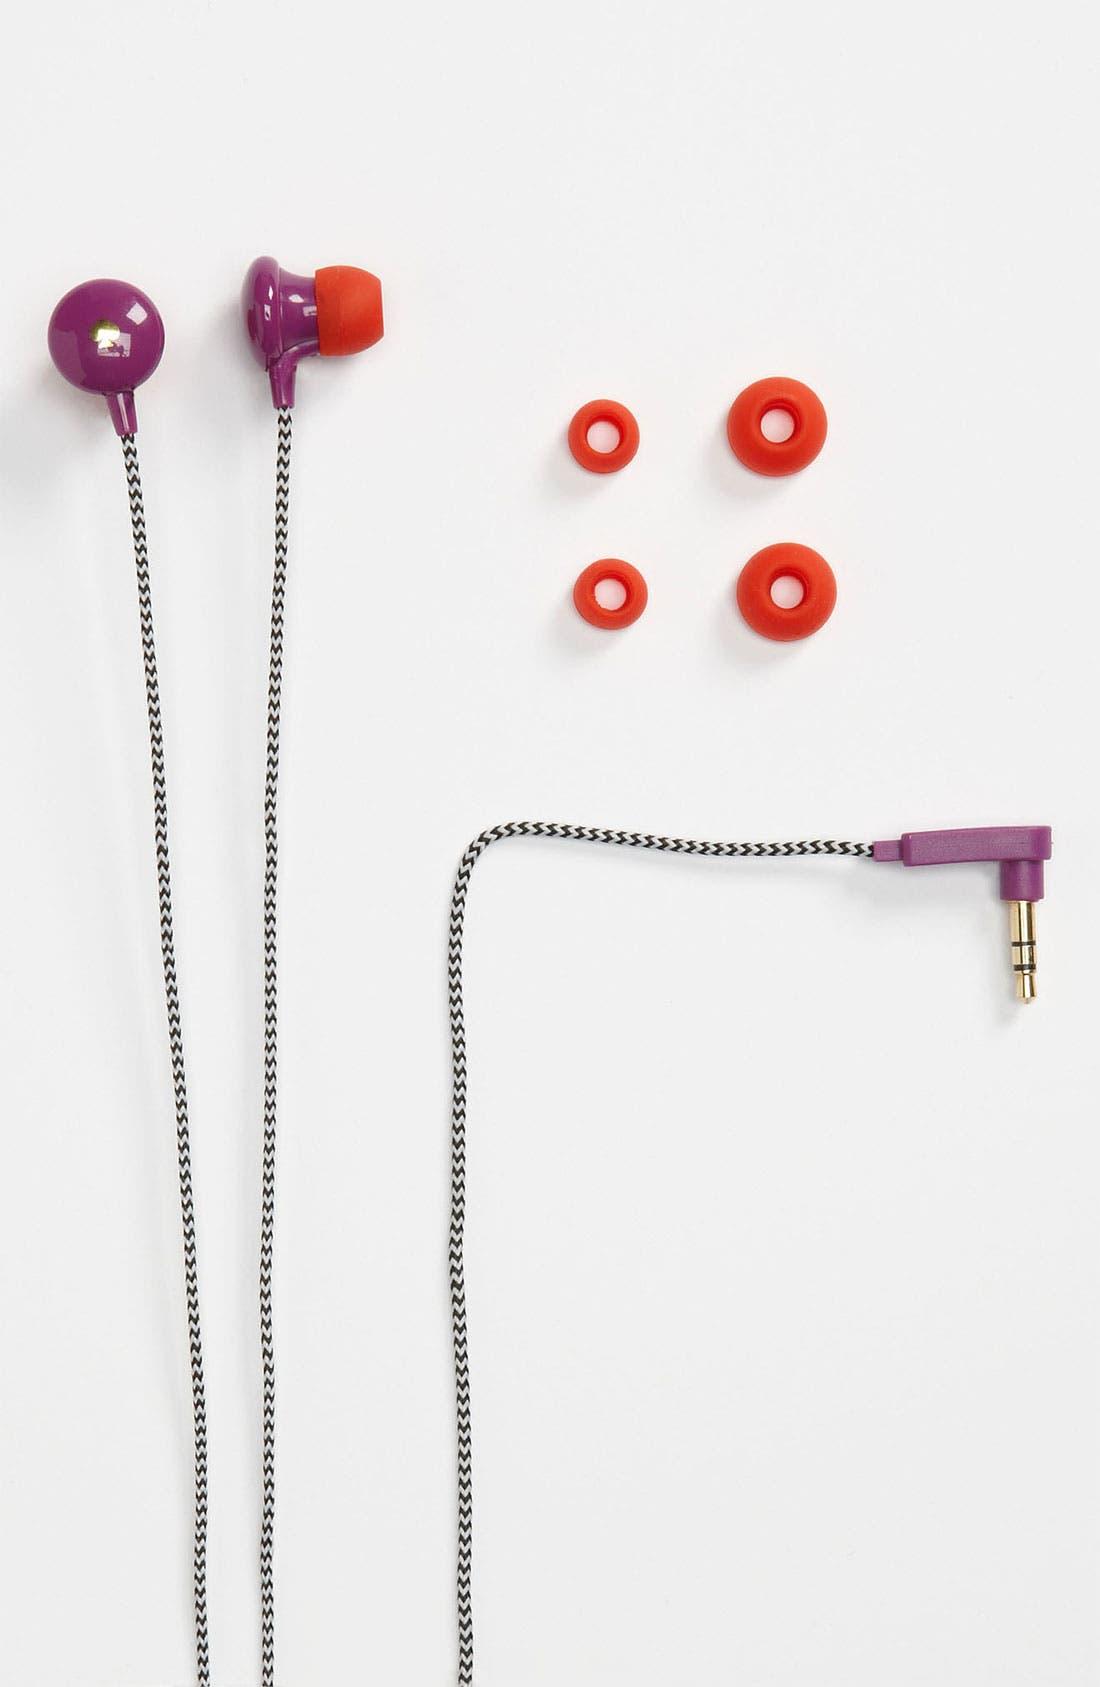 Alternate Image 1 Selected - kate spade new york 'signature spade' Earbuds